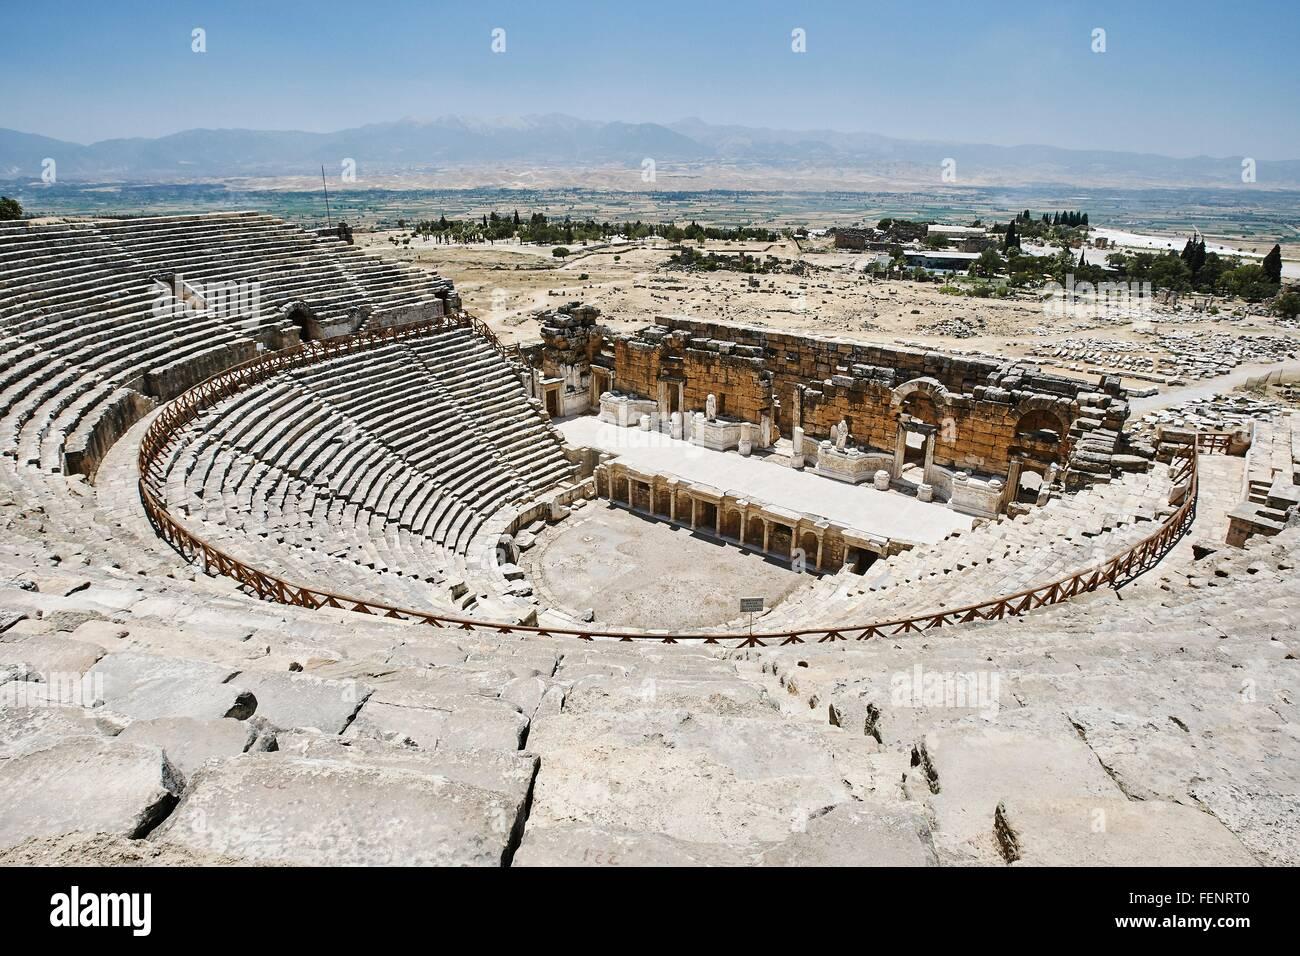 Elevated view of ancient Roman amphitheatre, Hierapolis, Pamukkale, Anatolia, Turkey - Stock Image